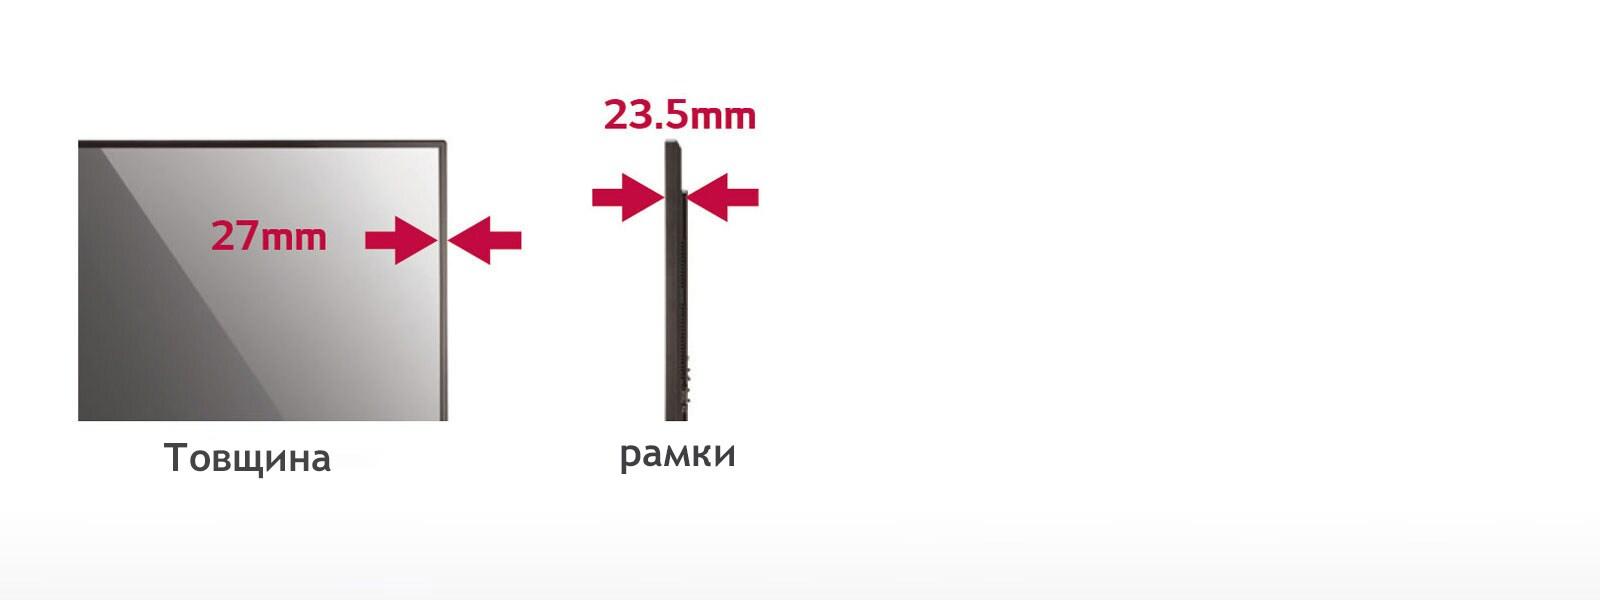 01_Multi-Touch-with-Slim-Bezel_1478499446097_UA_XL_170418